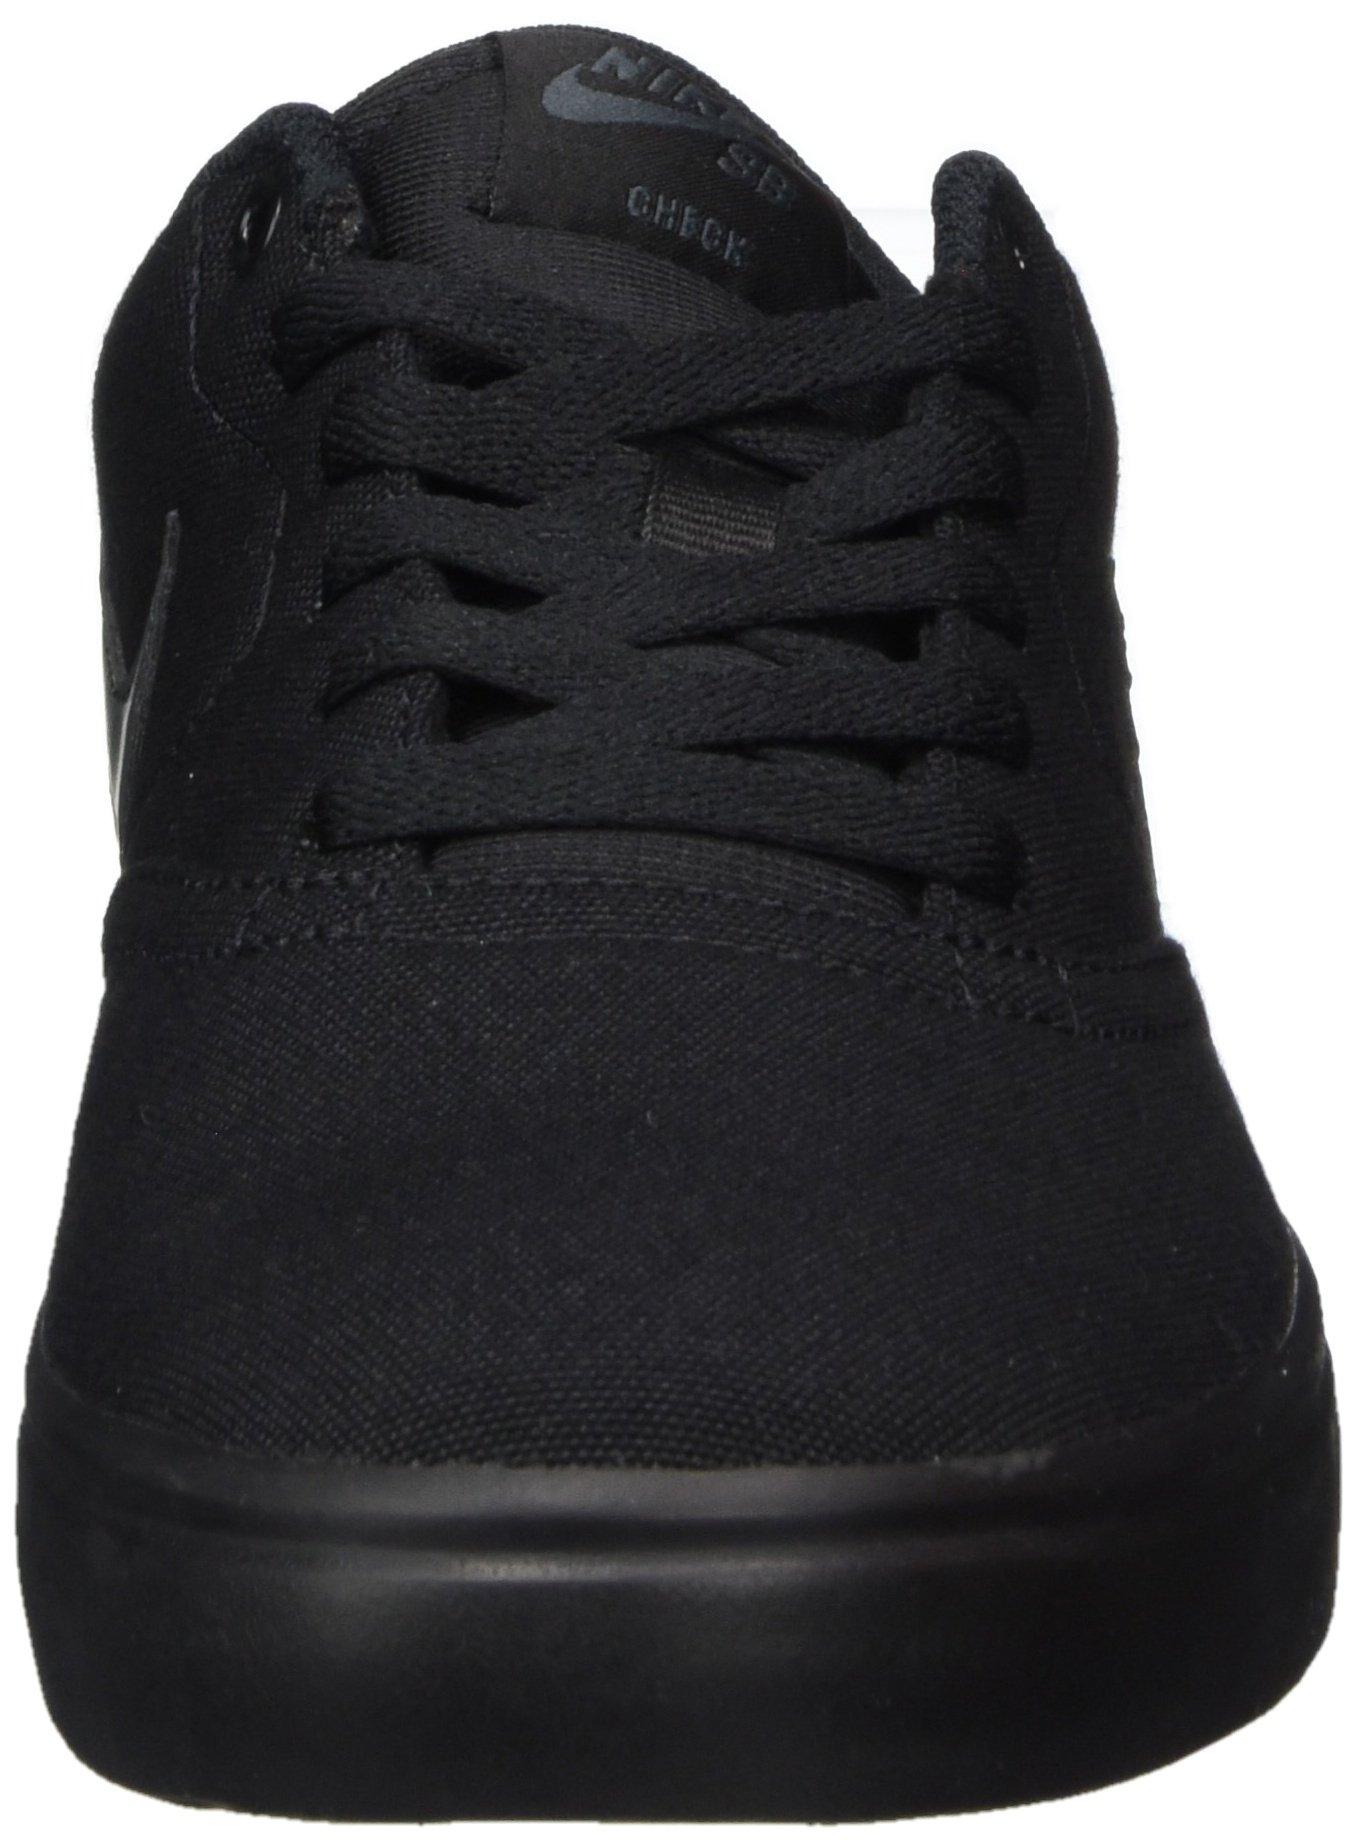 Nike Unisex SB Check Solar CNVS Black/Anthracite Skate Shoe 8.5 Men US / 10 Women US by Nike (Image #4)